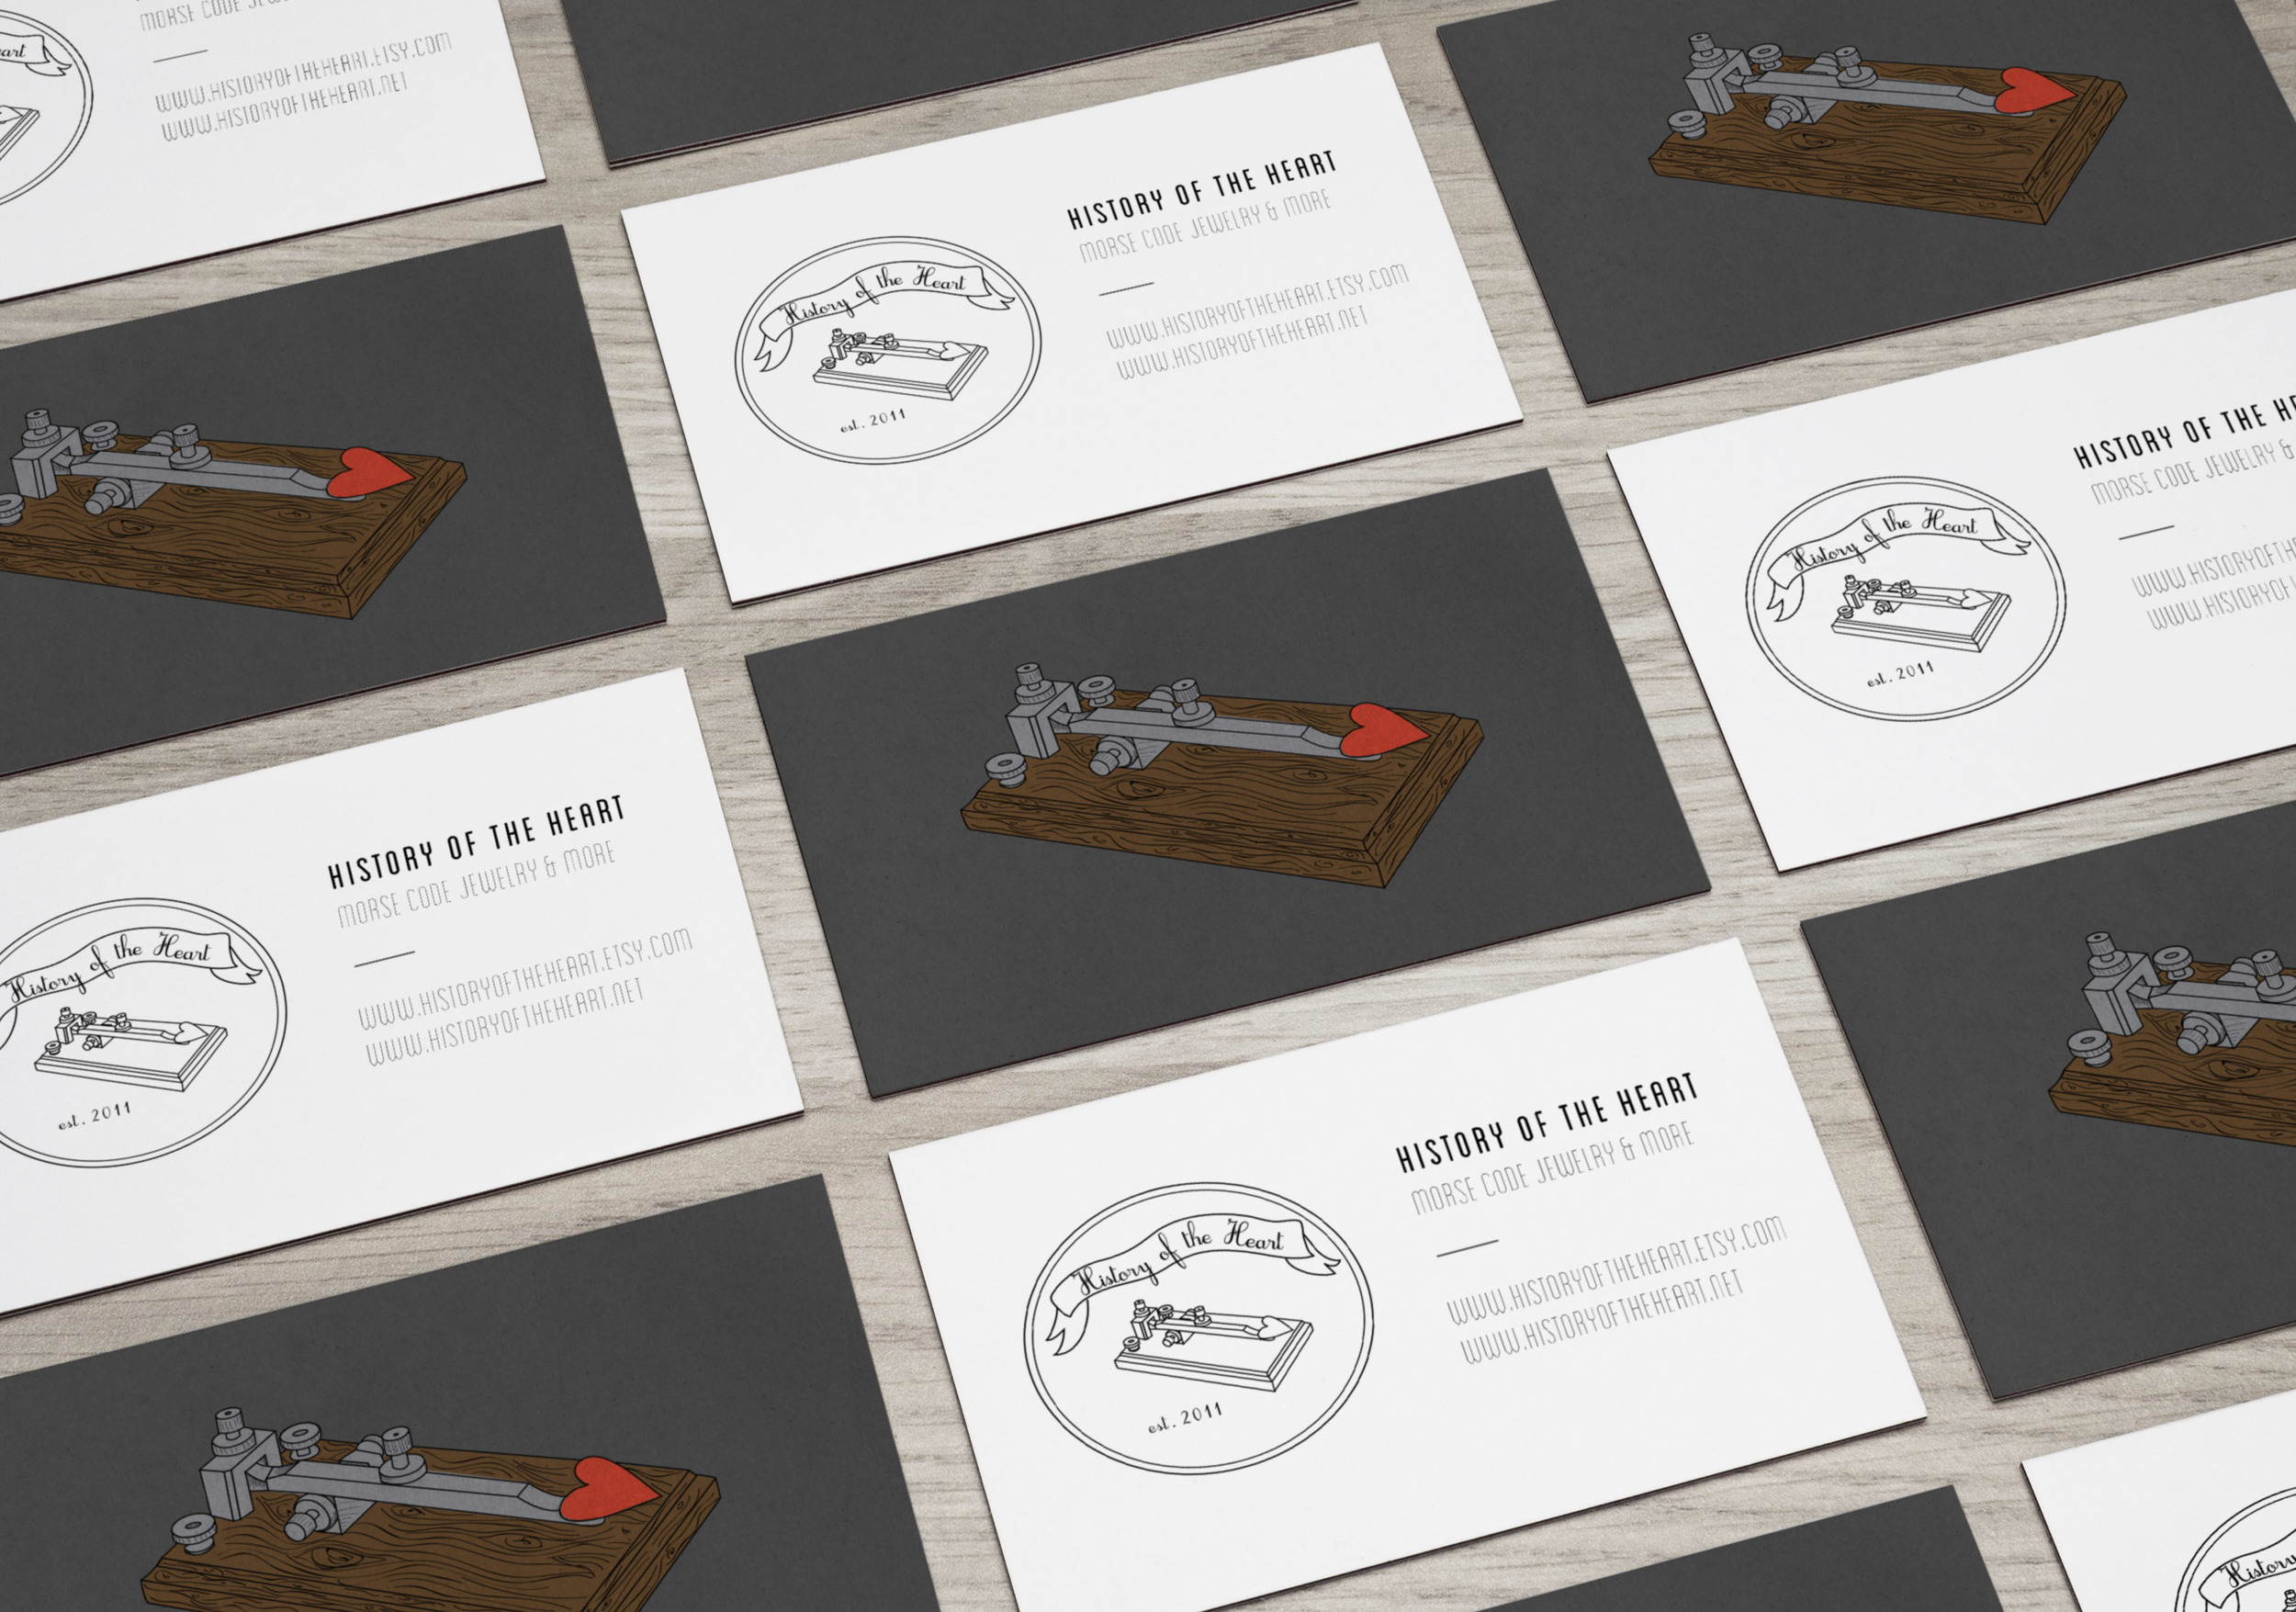 HistoryoftheHeart_Businesscards.jpg